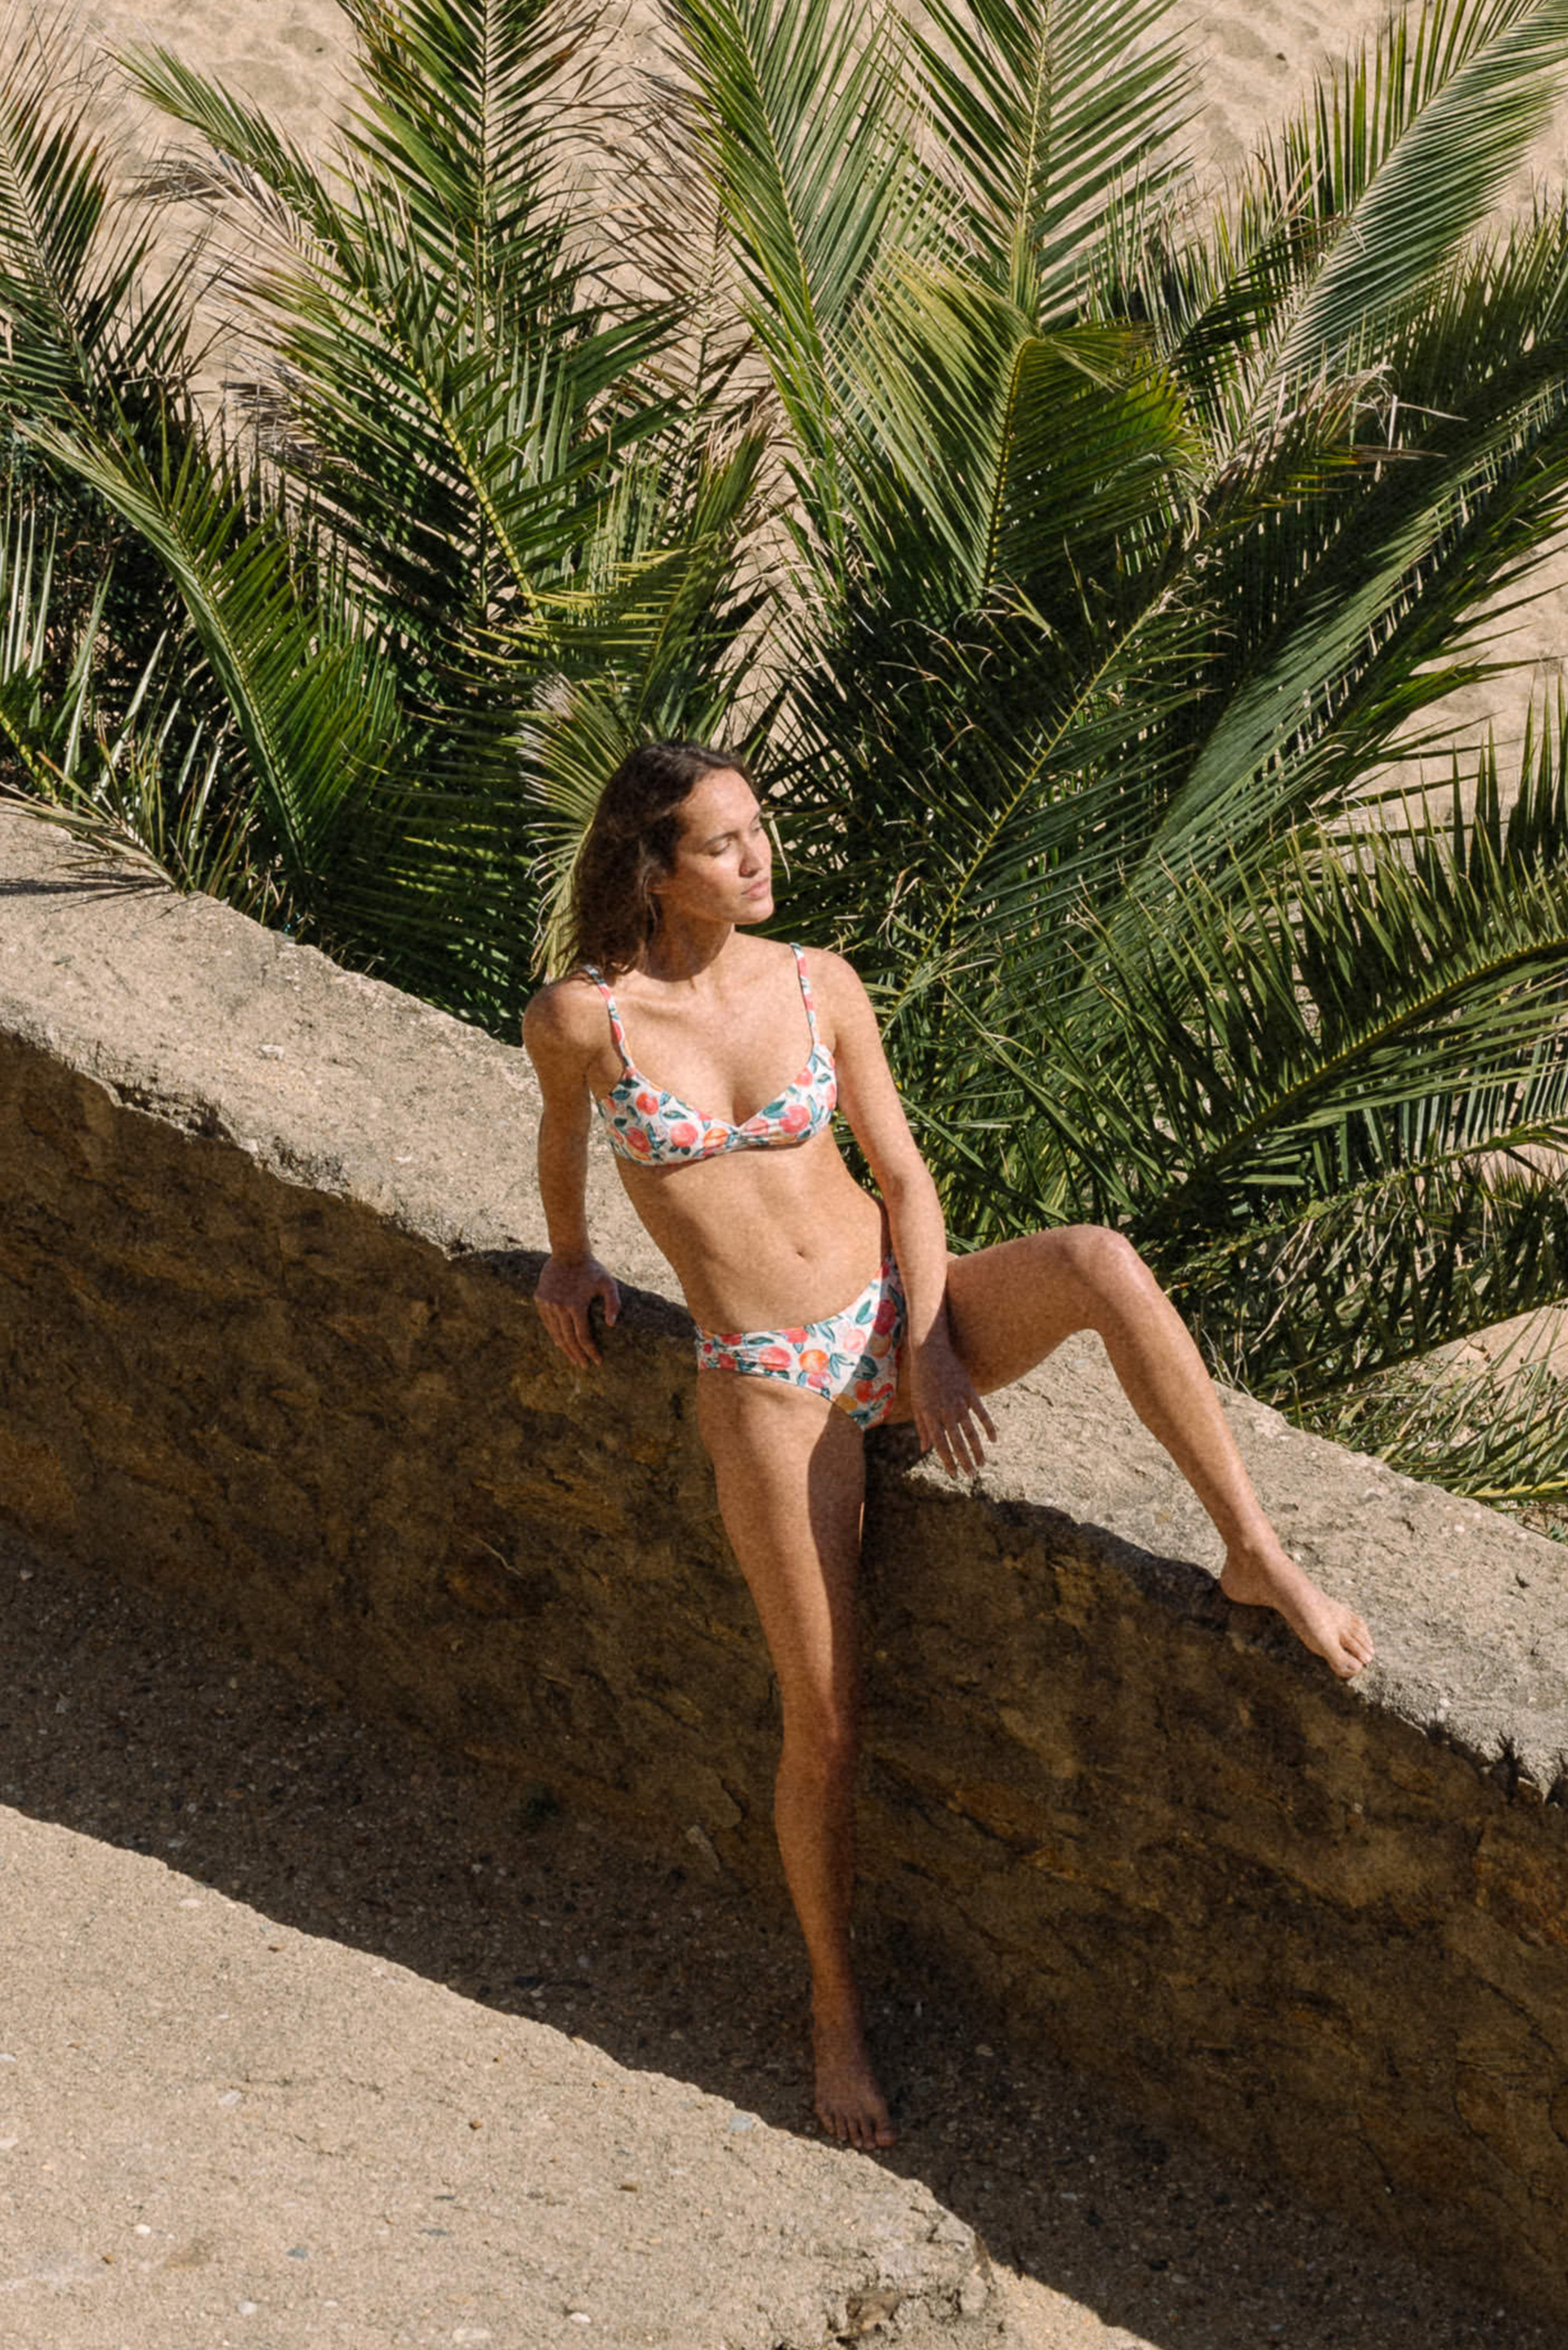 Swimsuit Baiser coquillage with Tutti frutti print